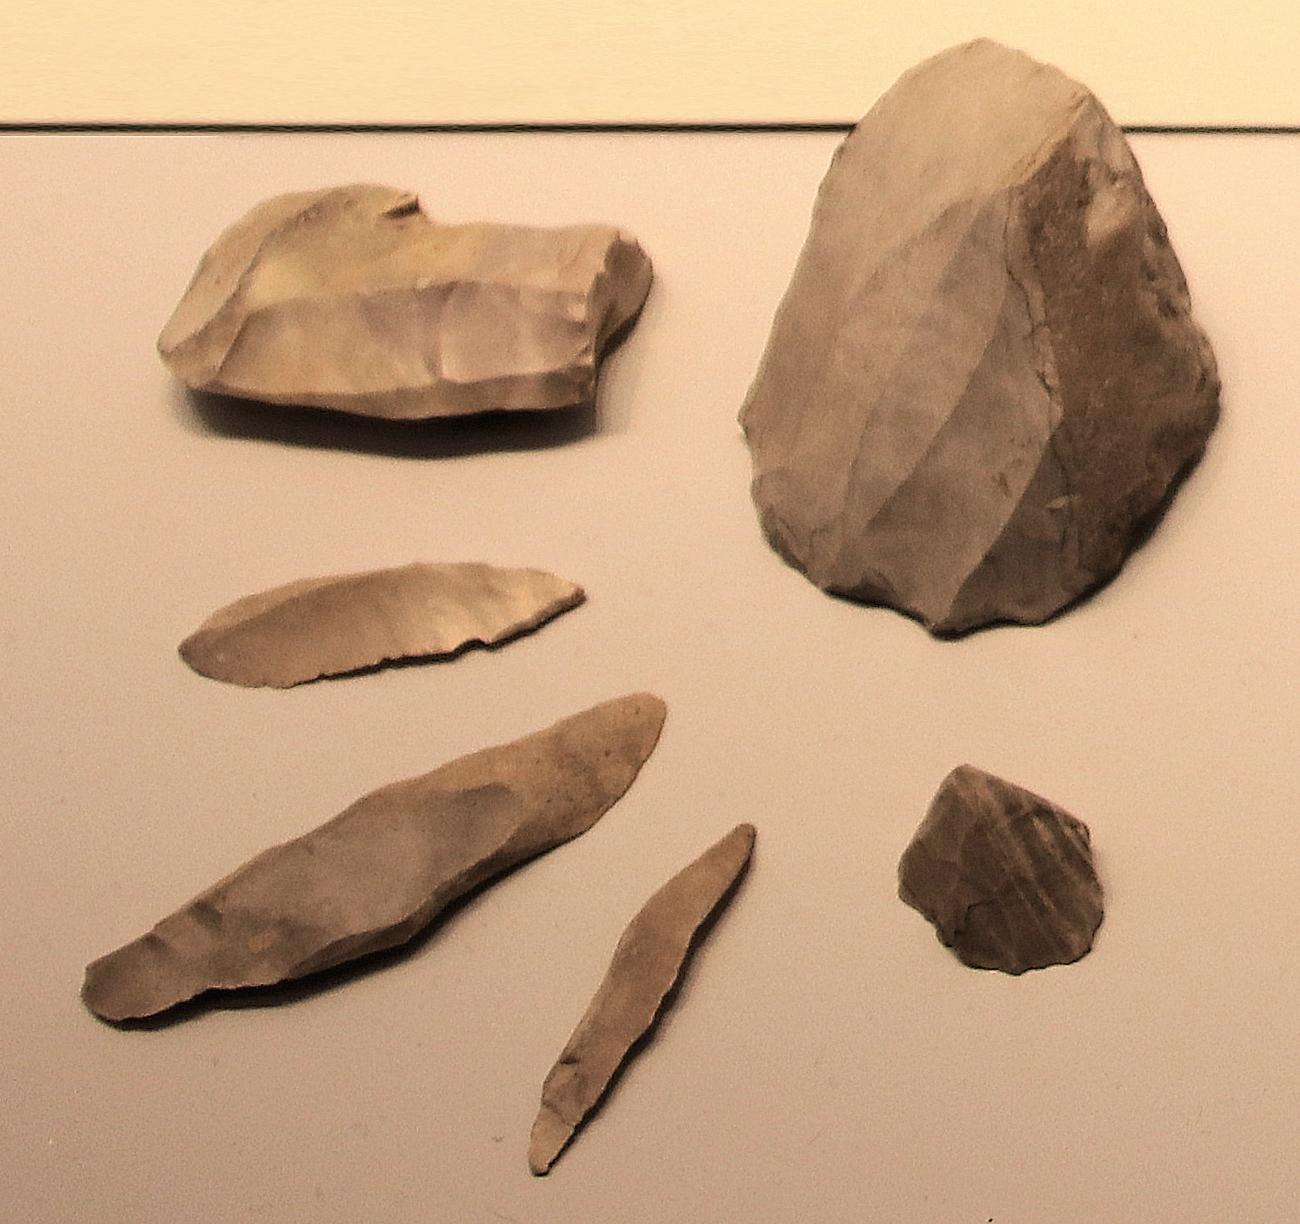 Microlith wikipedia . Arrowhead clipart stone tool